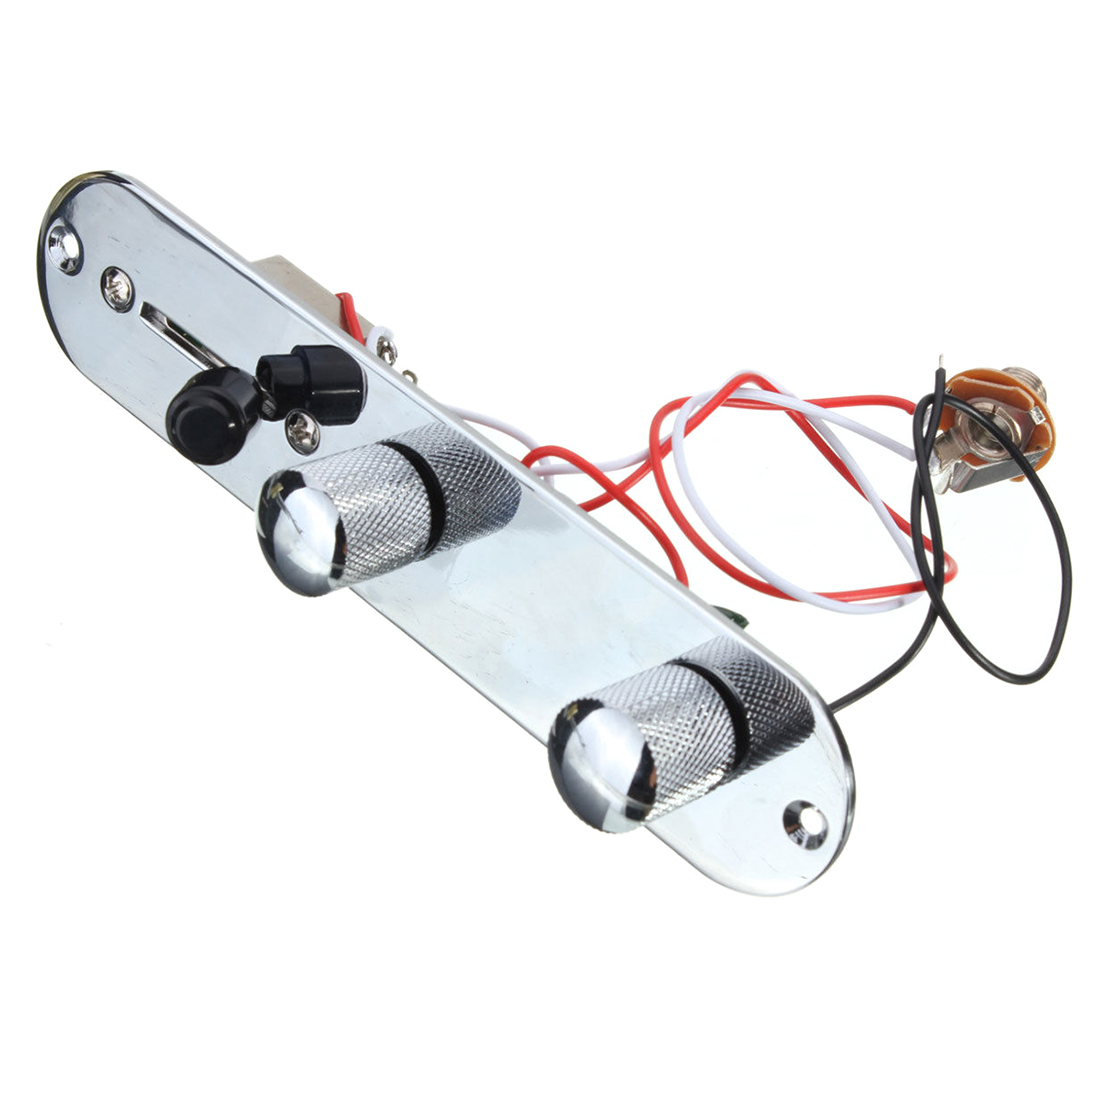 Placa de Control cromada para Tele guitarra Telecaster completamente cableada